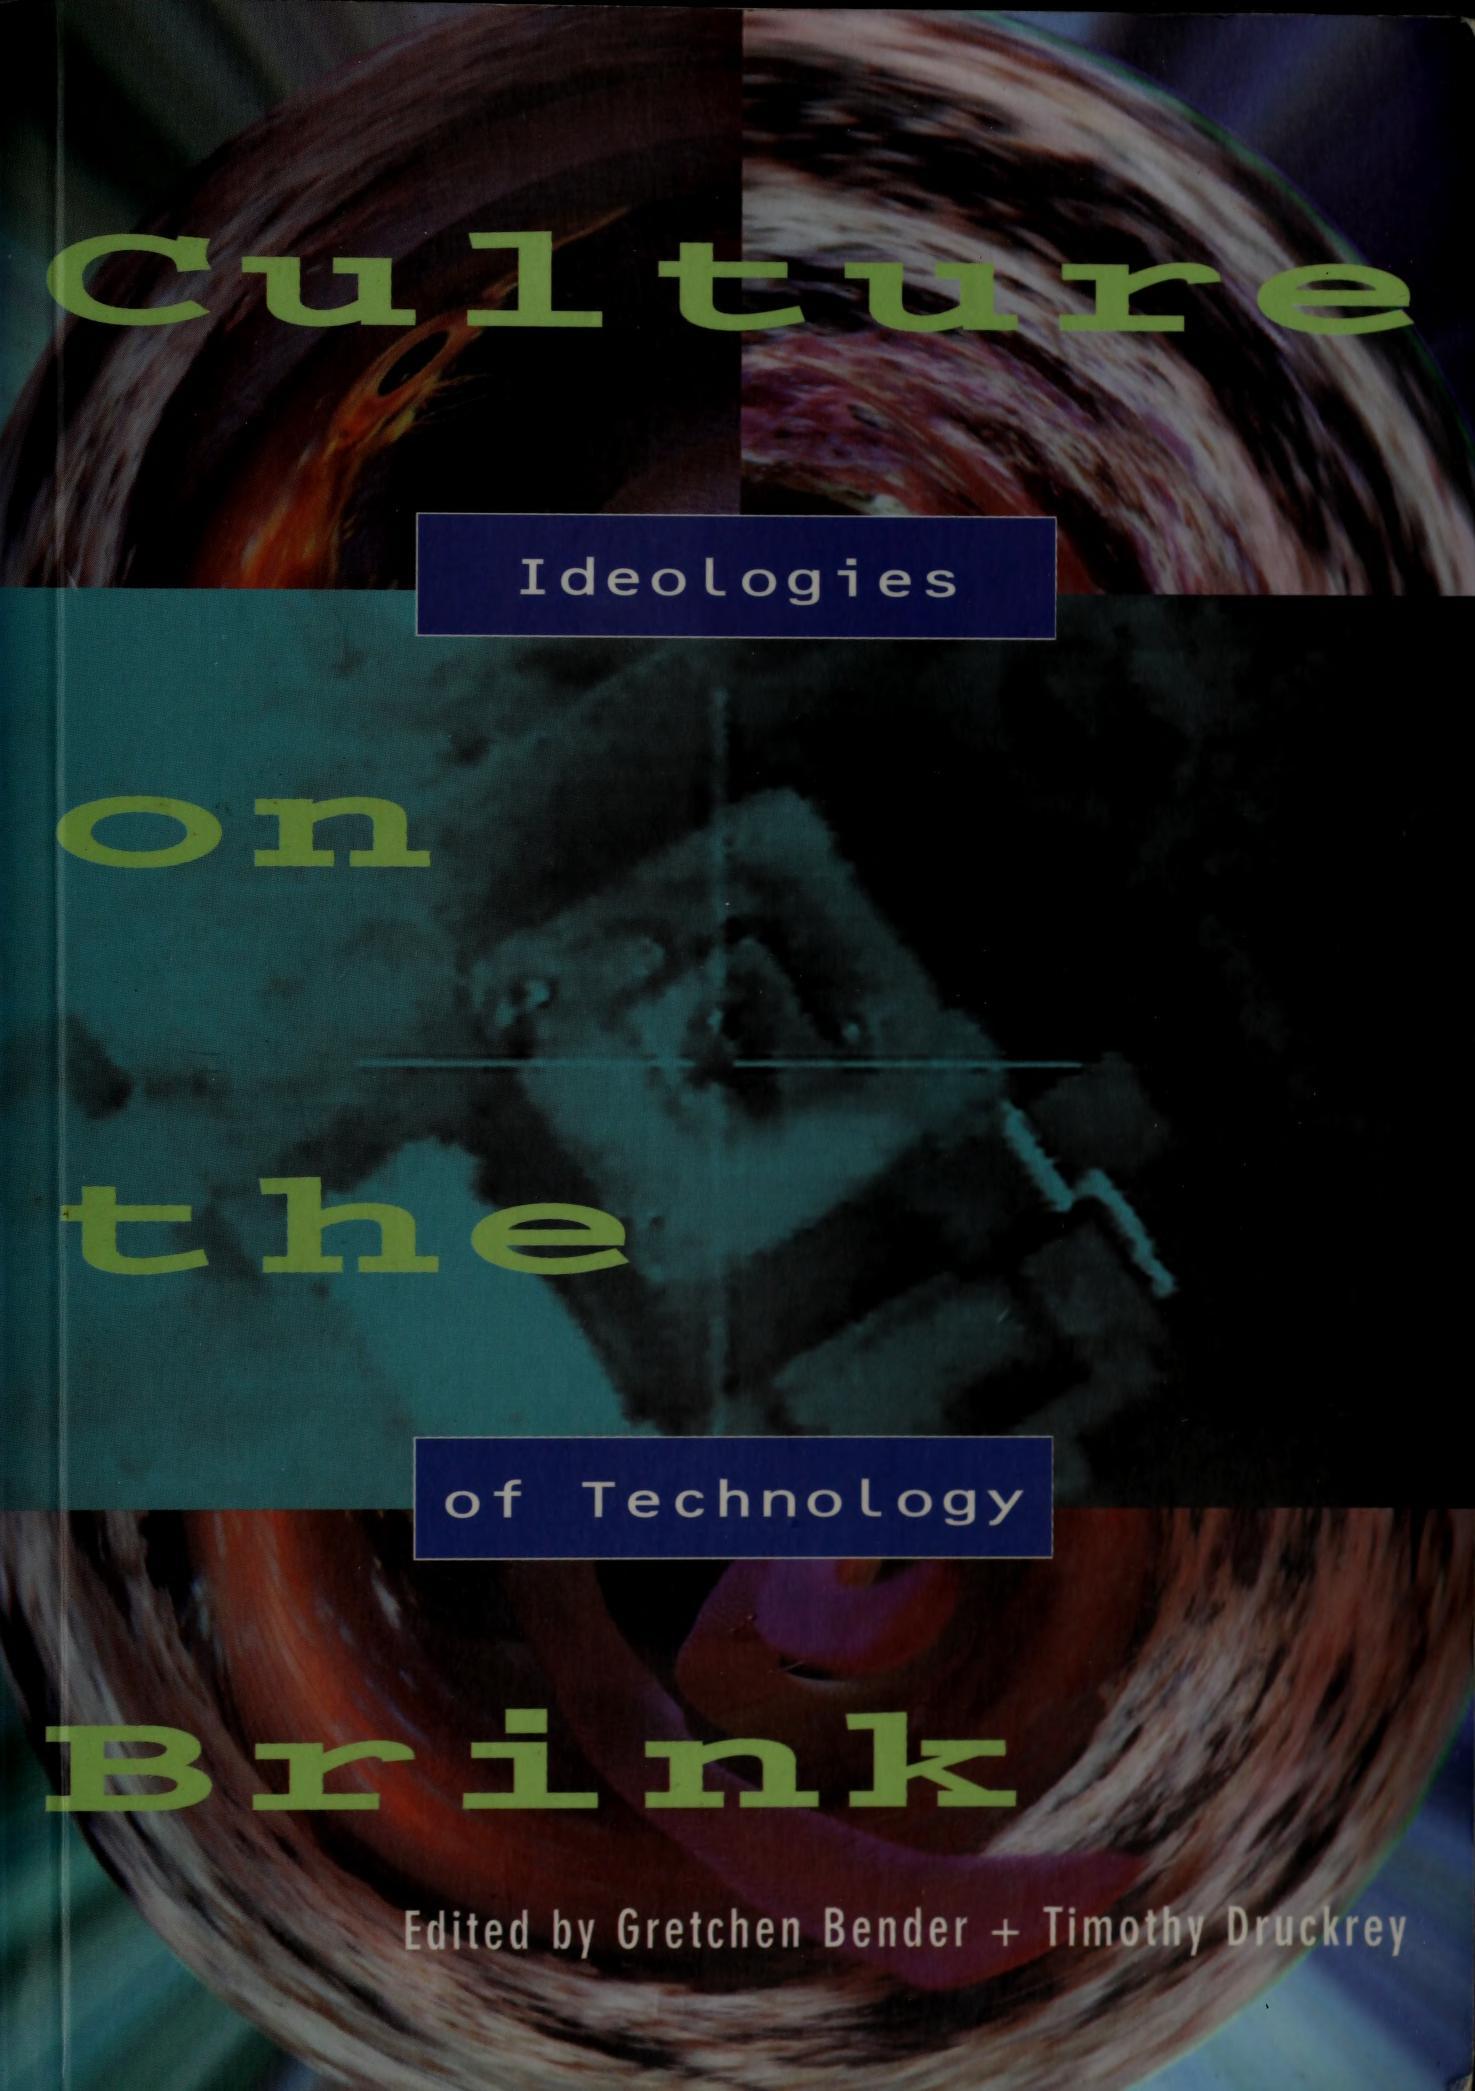 Gretchen Bender, Timothy Druckrey (eds.): Culture on the Brink: Ideologies of Technology (1994)